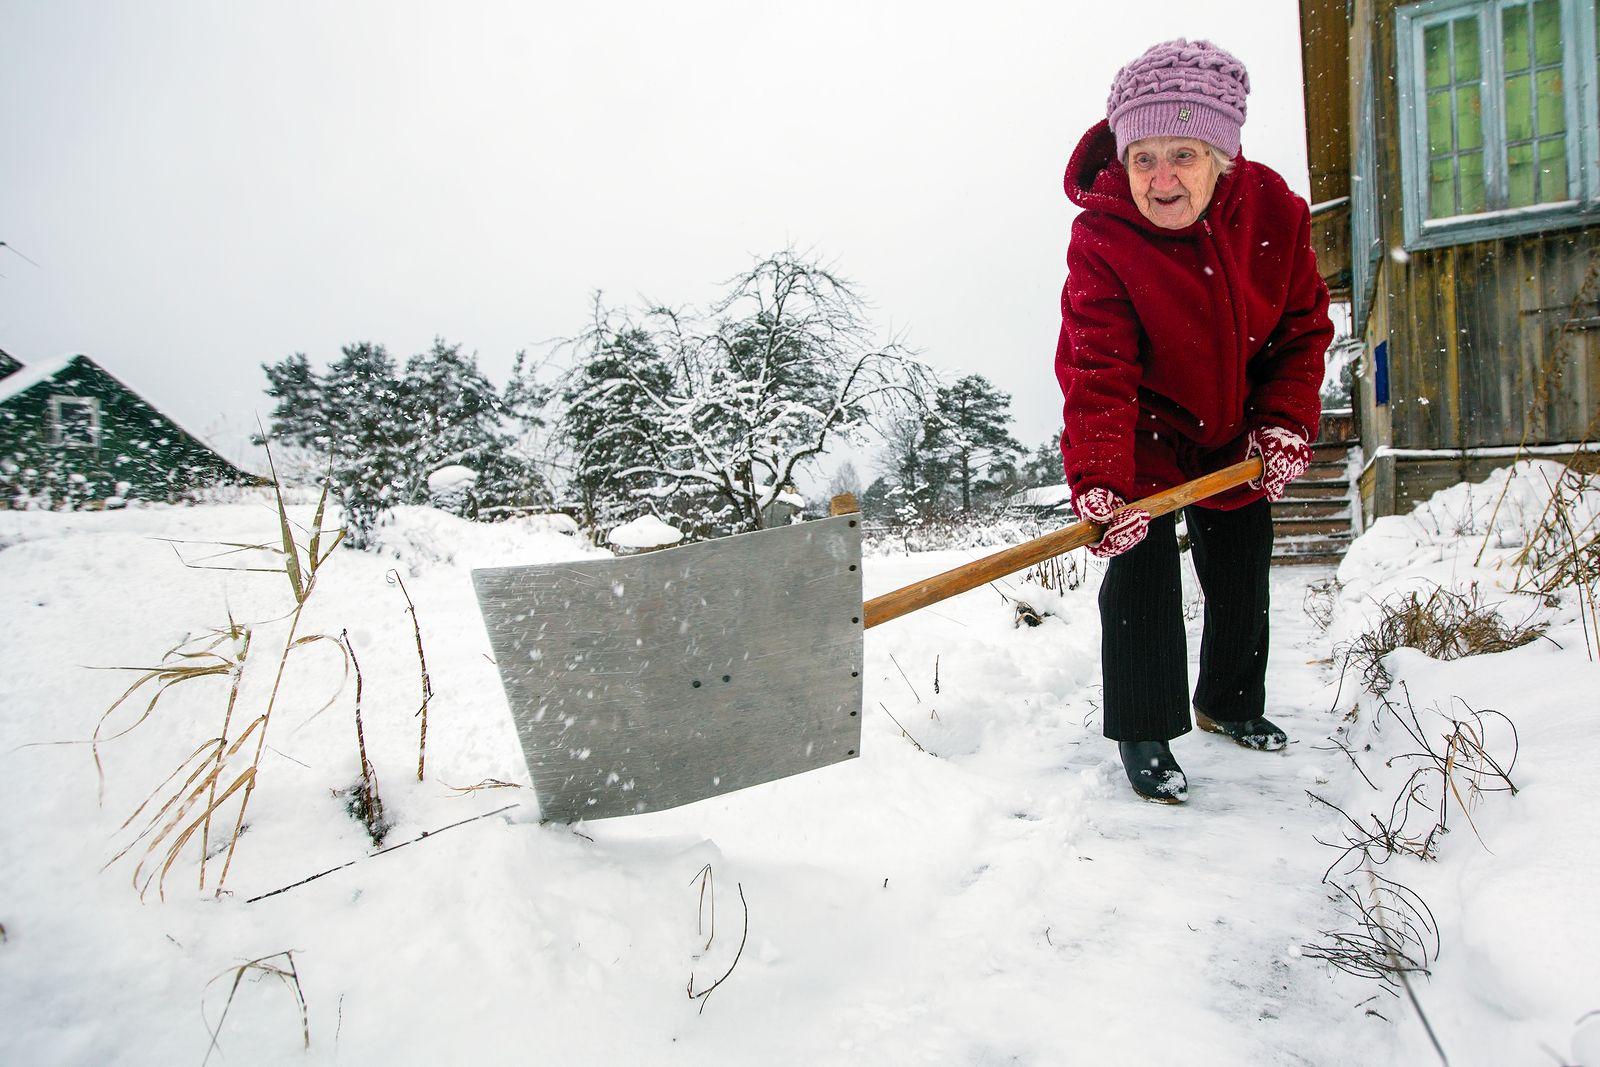 6 Winter Safety Tips for Older Adults Elderly care